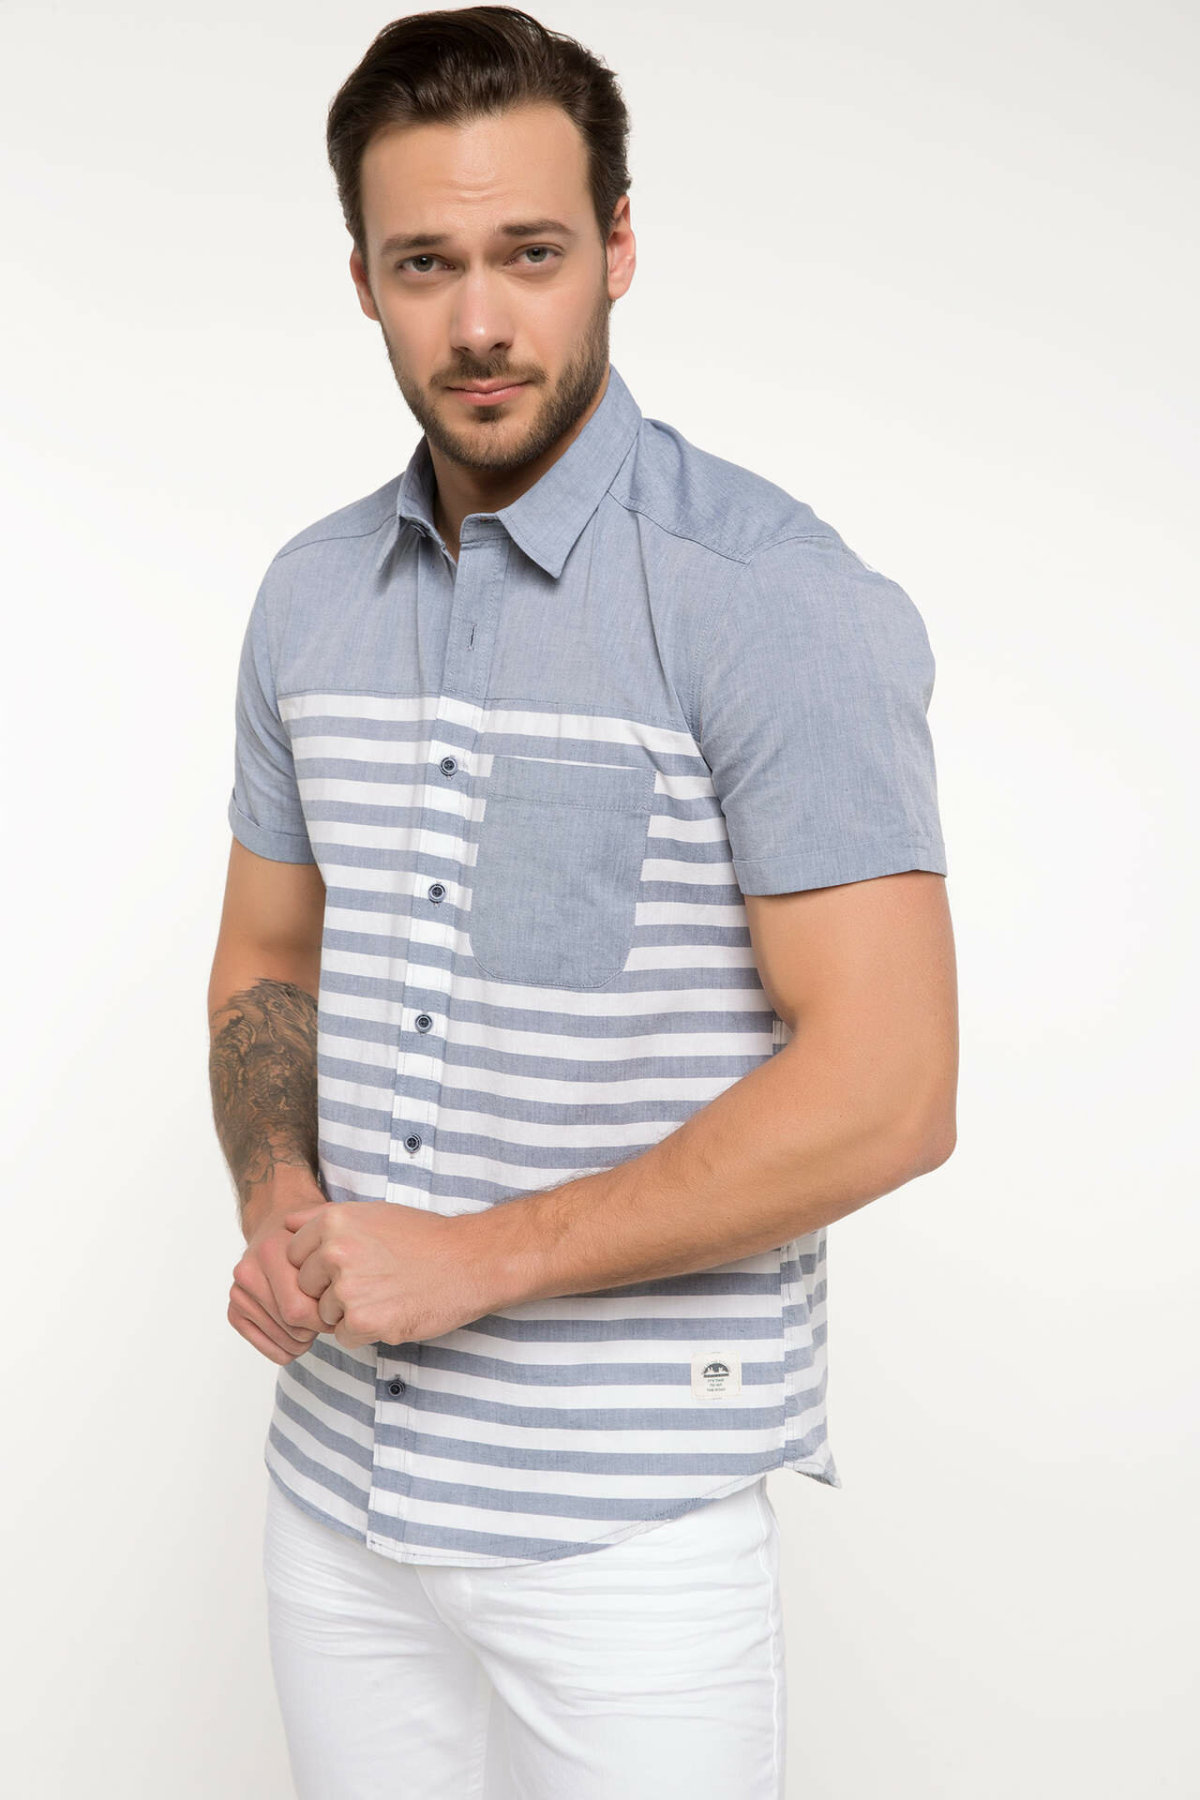 DeFacto Men Fashion Simple Shirts Short Sleeve Striped Shirts Mens Casual Lapel Collar Casual Shirt New-I6389AZ18SM